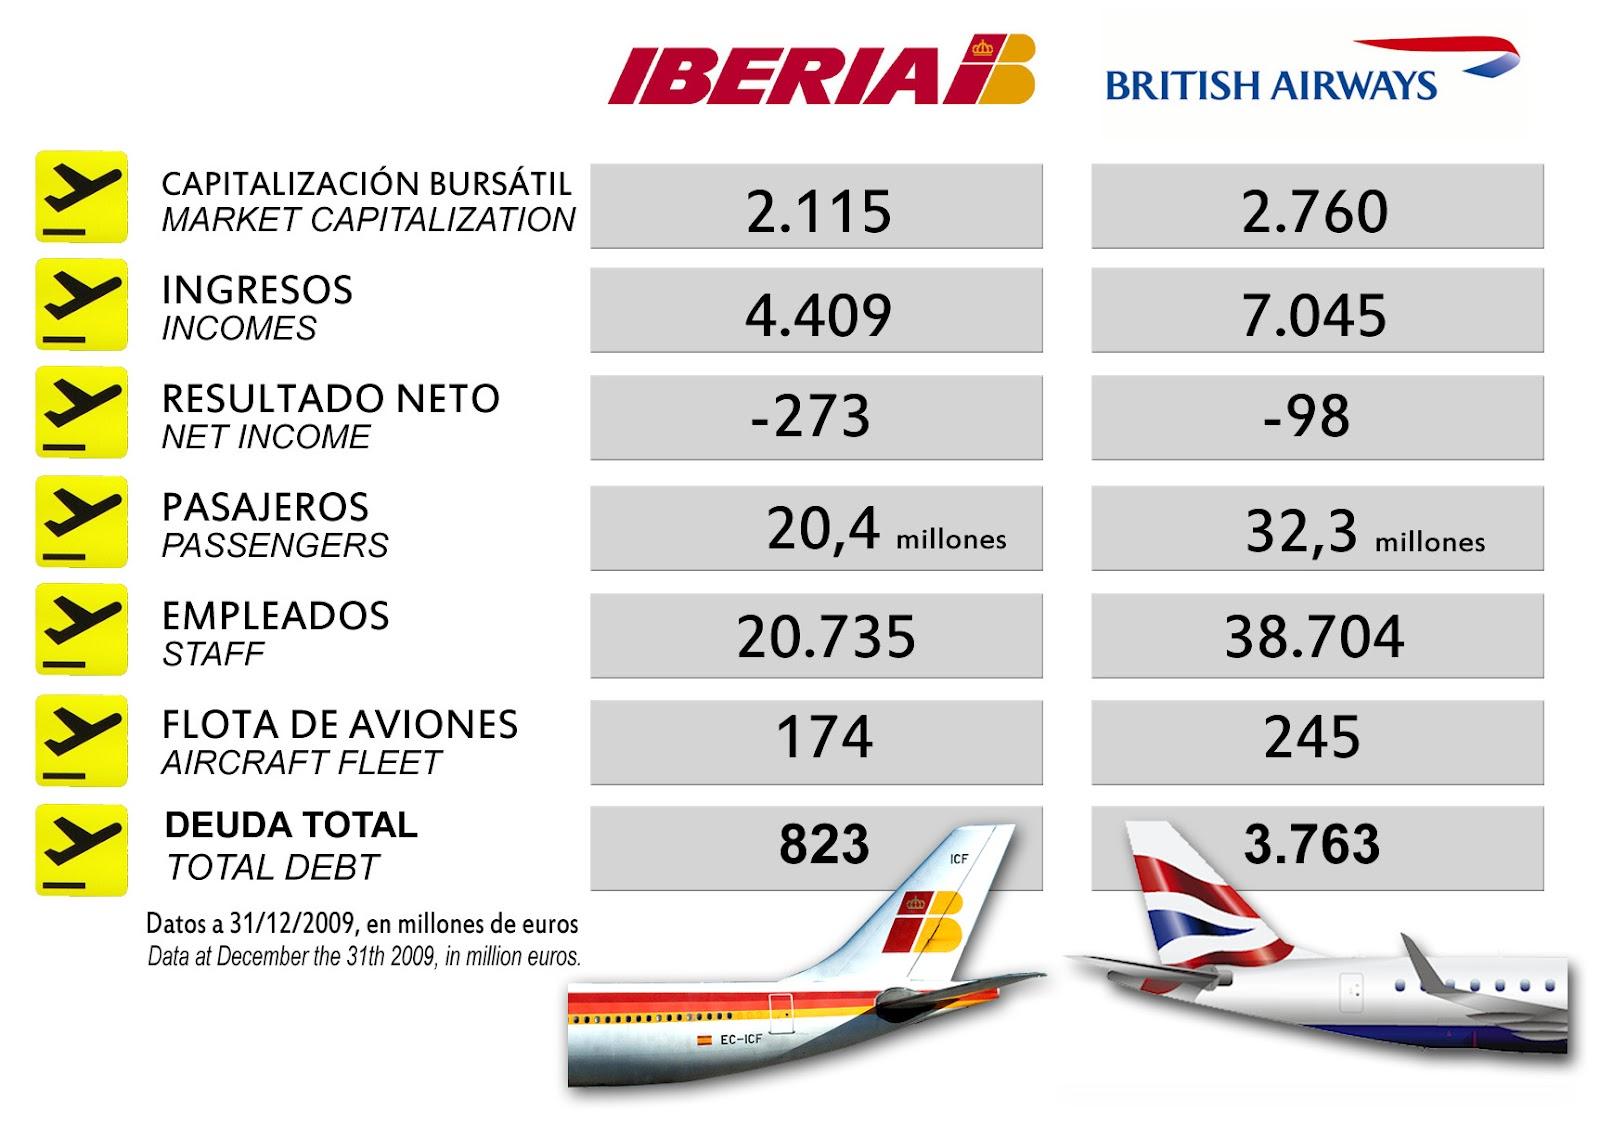 British Airways and Iberia sign merger agreement